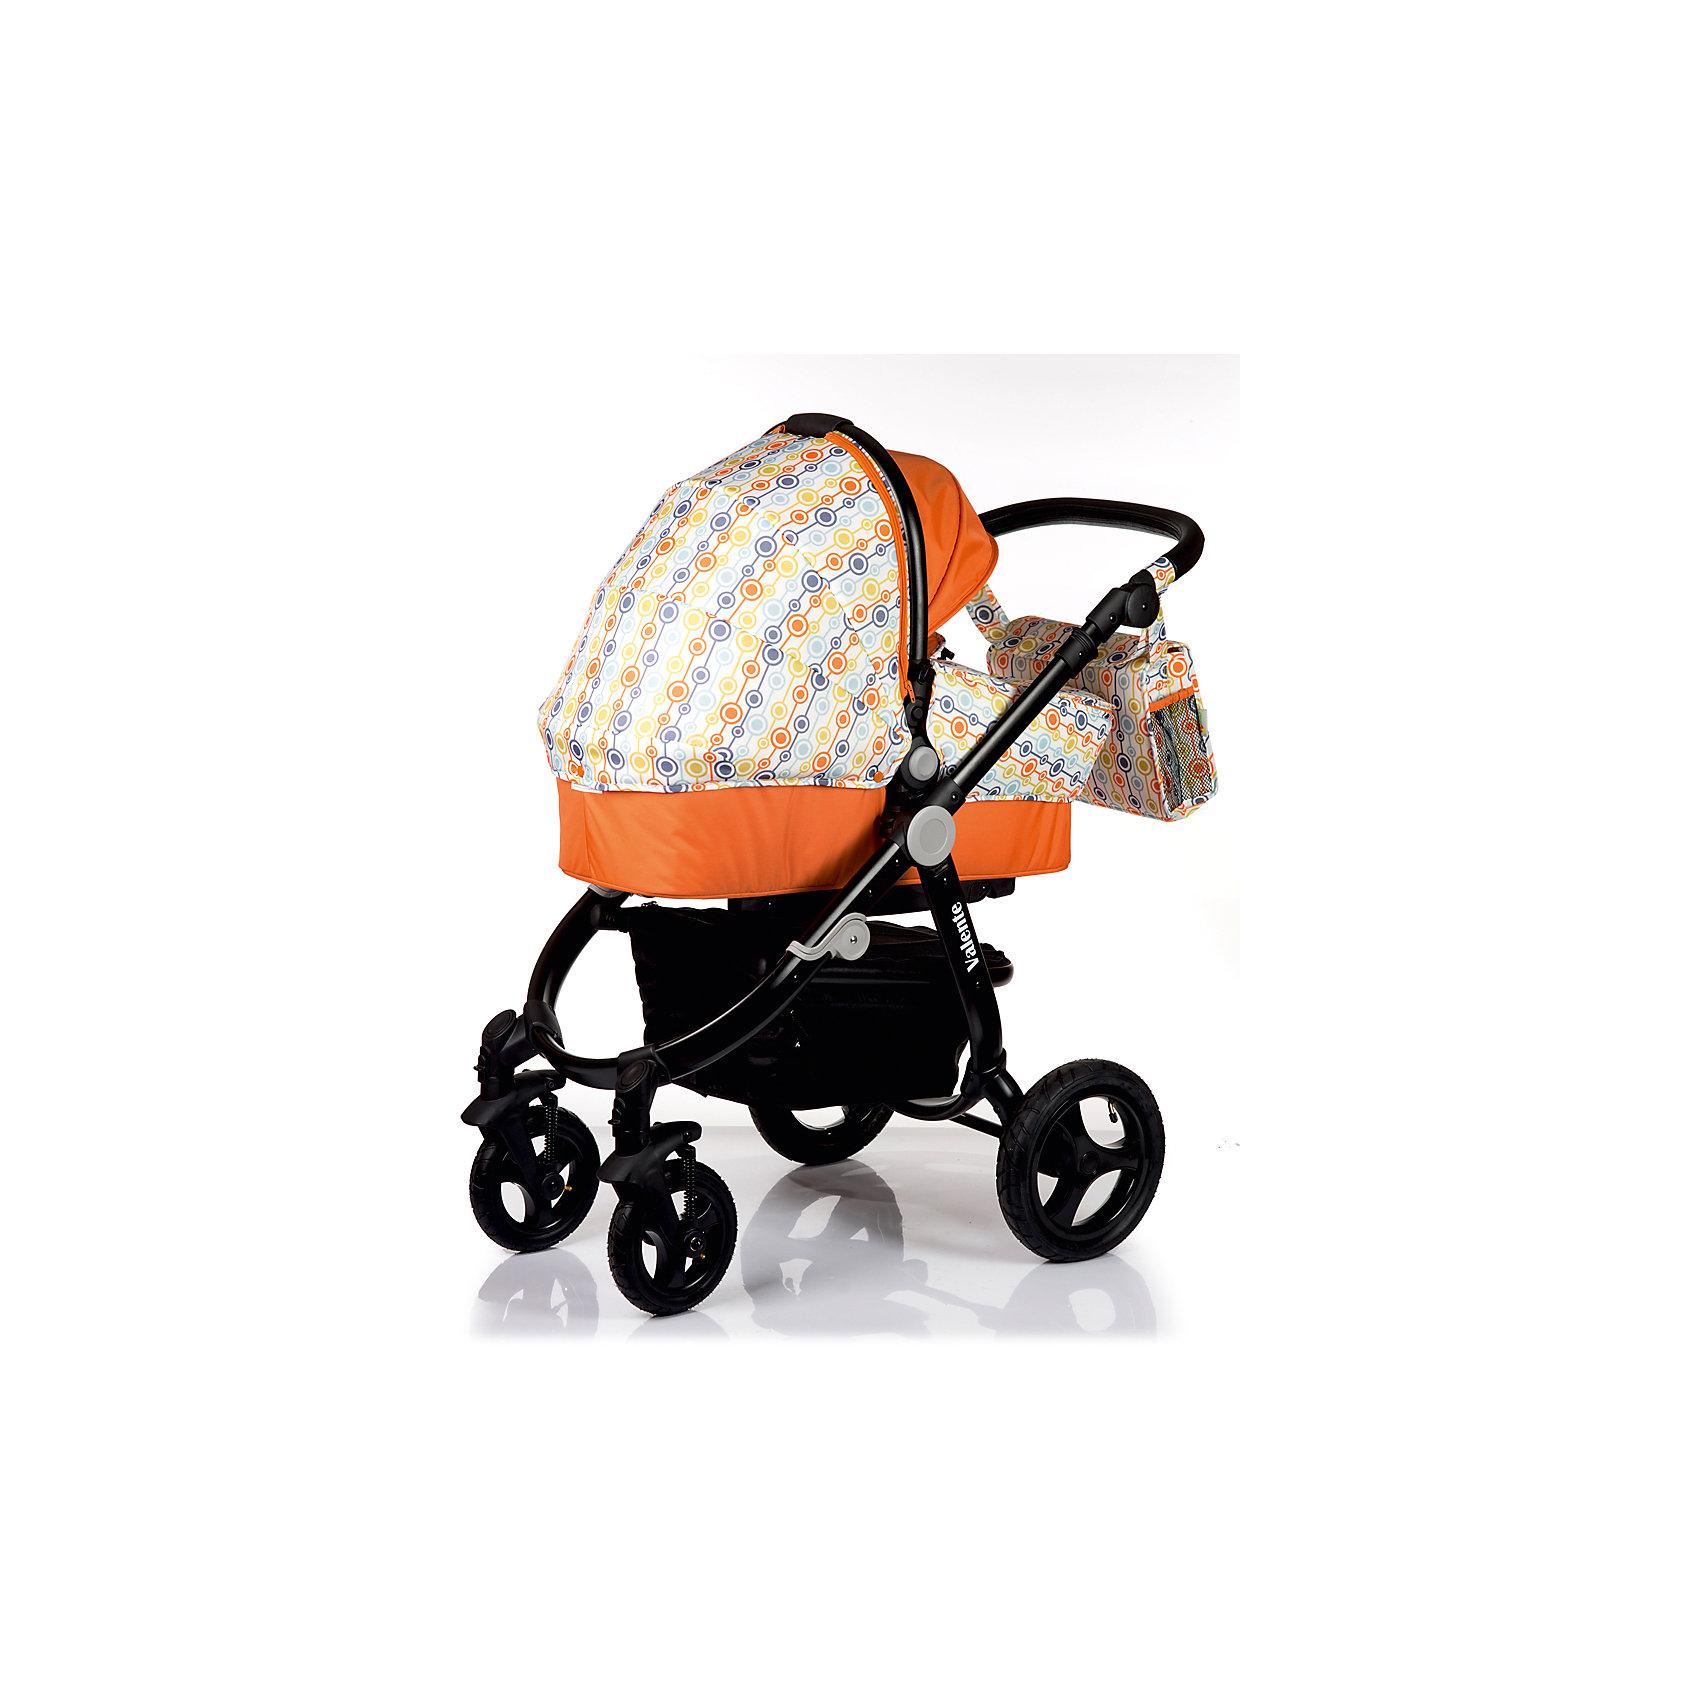 Baby Hit Коляска 2 в 1 BabyHit VALENTE, бело-оранжевый